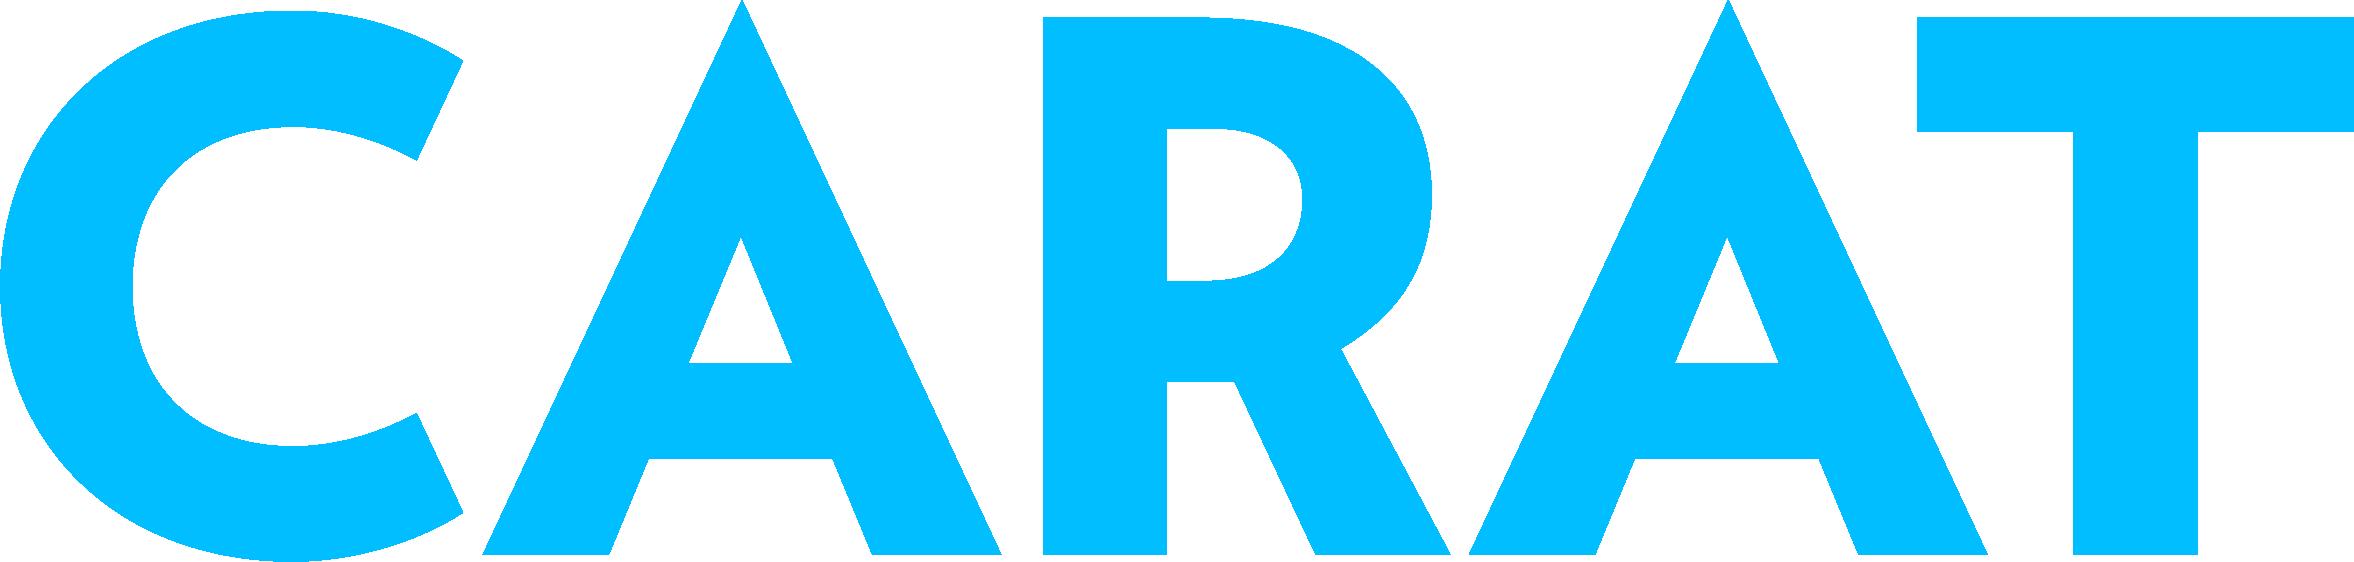 Carat Case study logo